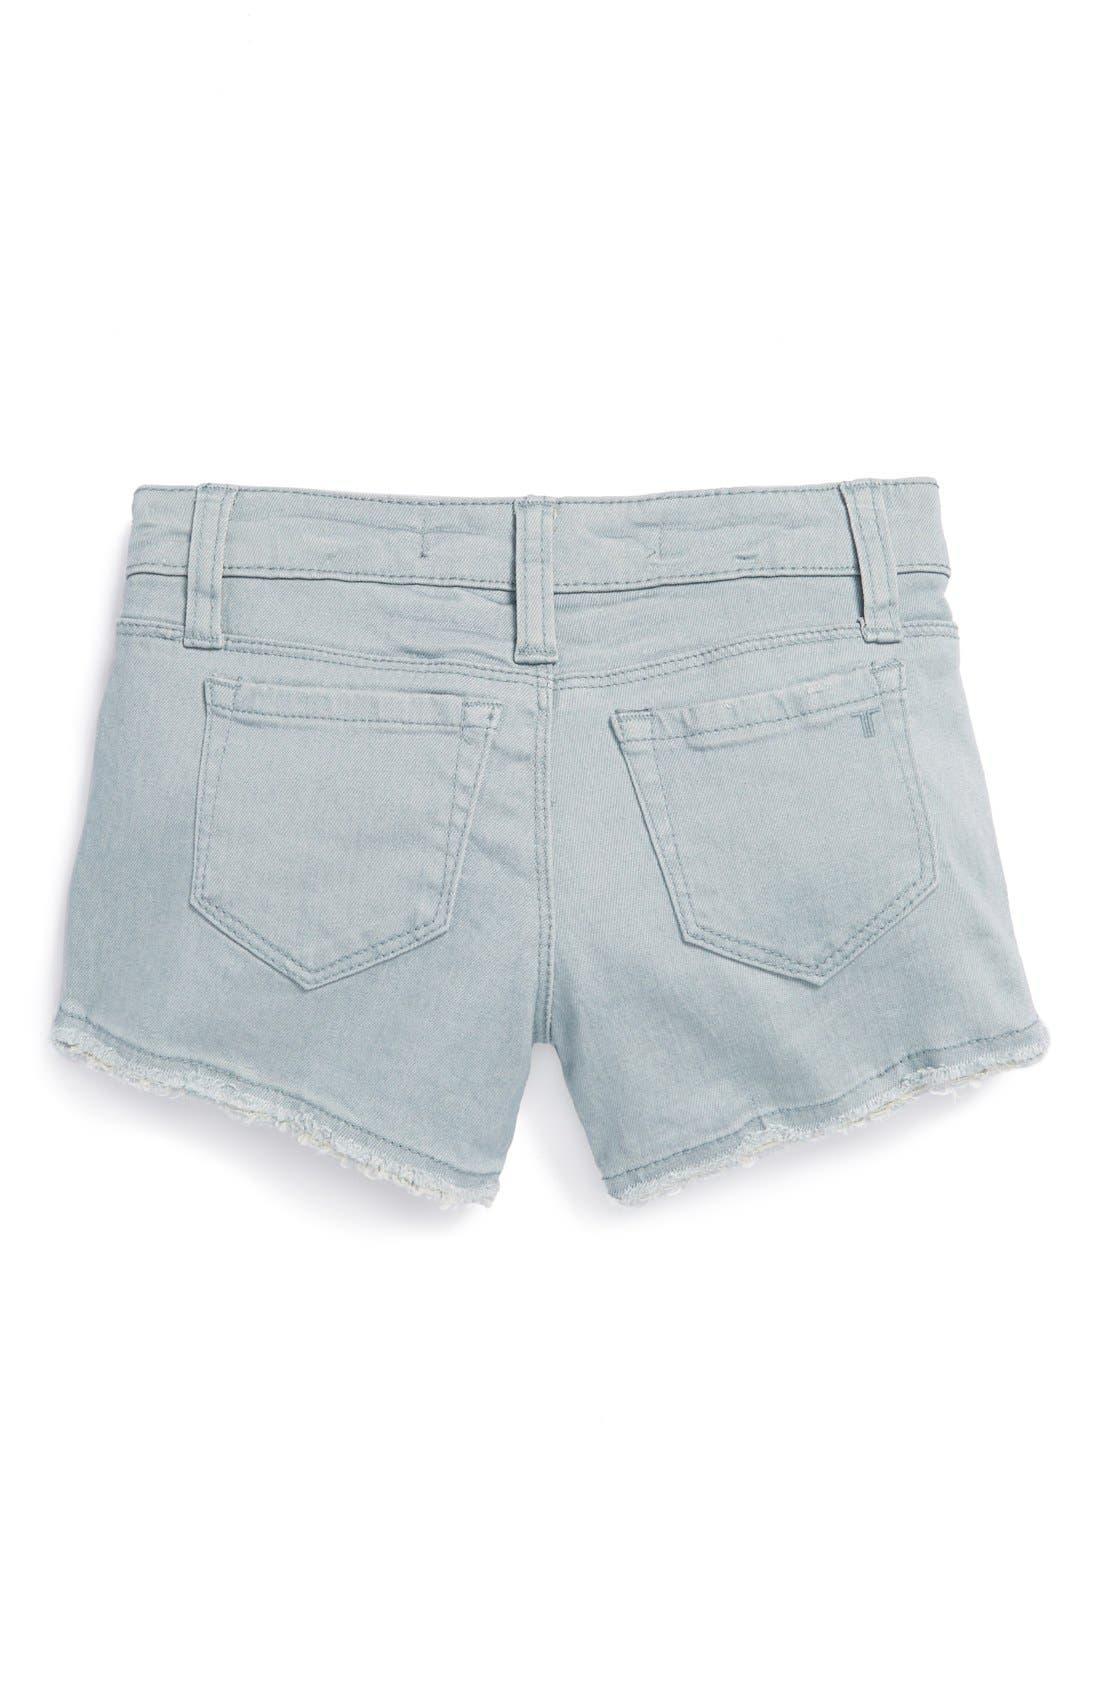 Main Image - Tractr Frayed Denim Shorts (Big Girls)